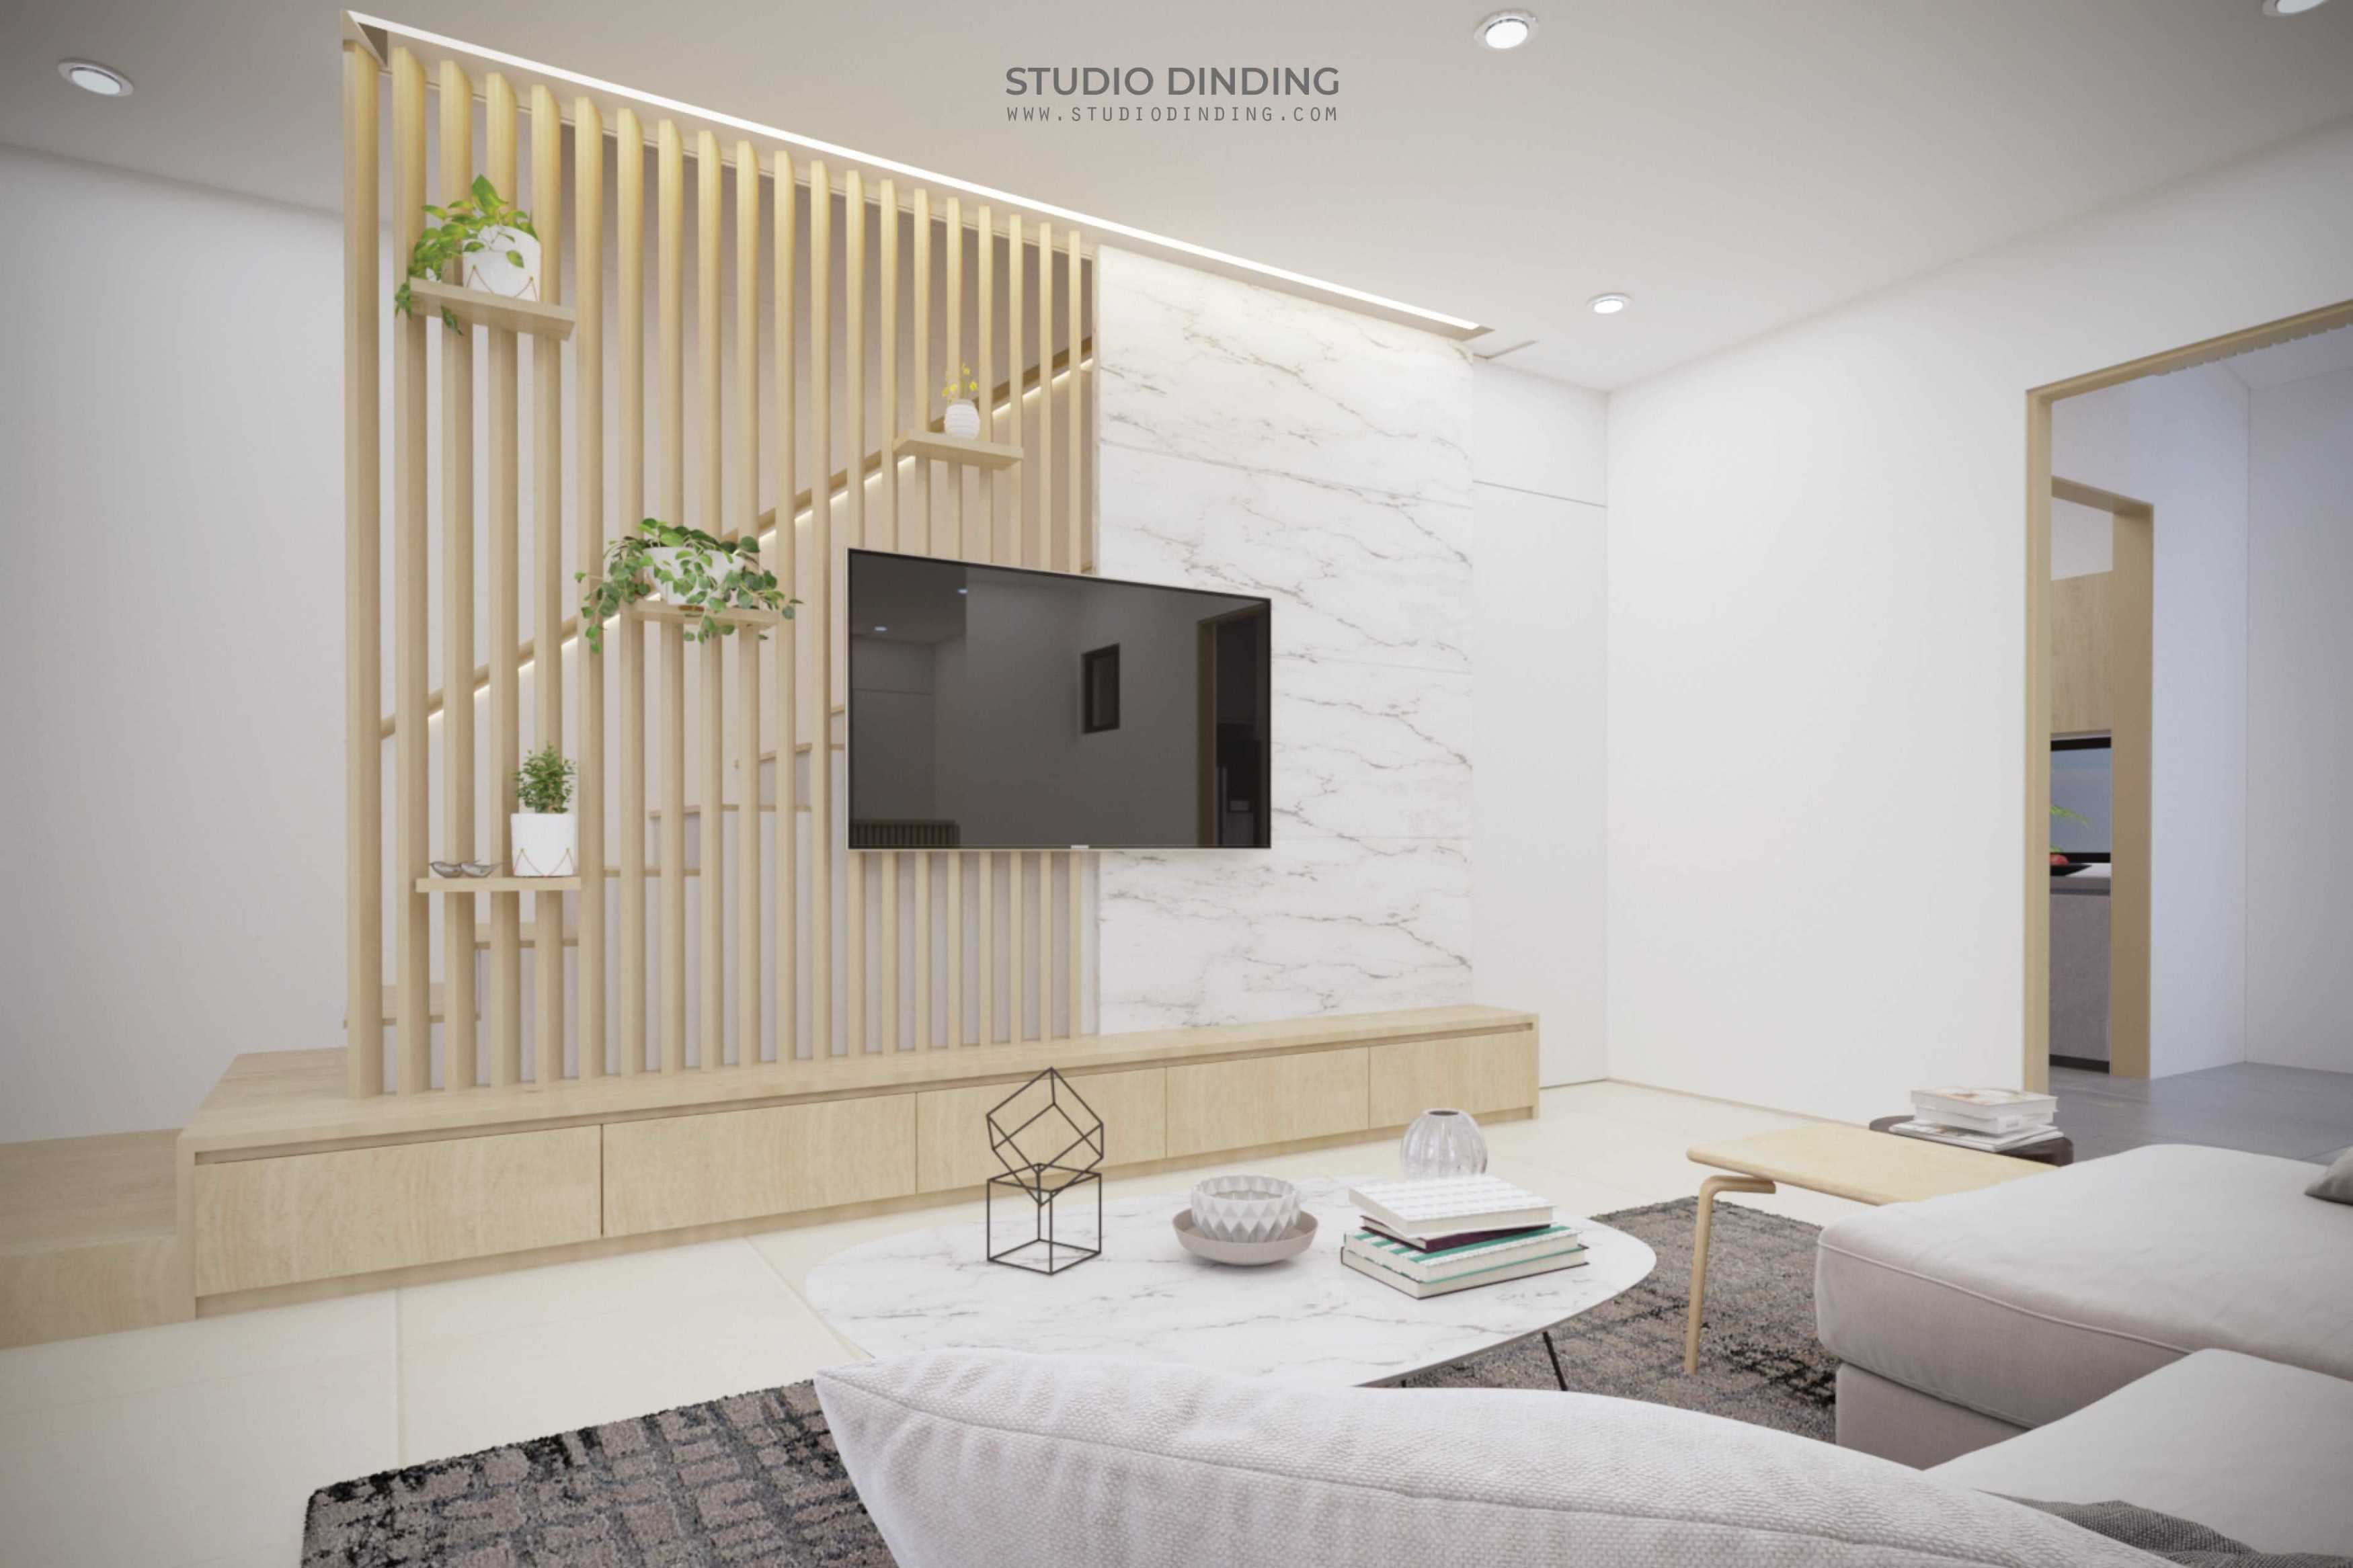 Studio Dinding Michelia 7 House Serpong, Kota Tangerang Selatan, Banten, Indonesia Serpong, Kota Tangerang Selatan, Banten, Indonesia Studio-Dinding-Michelia-7-House   56944